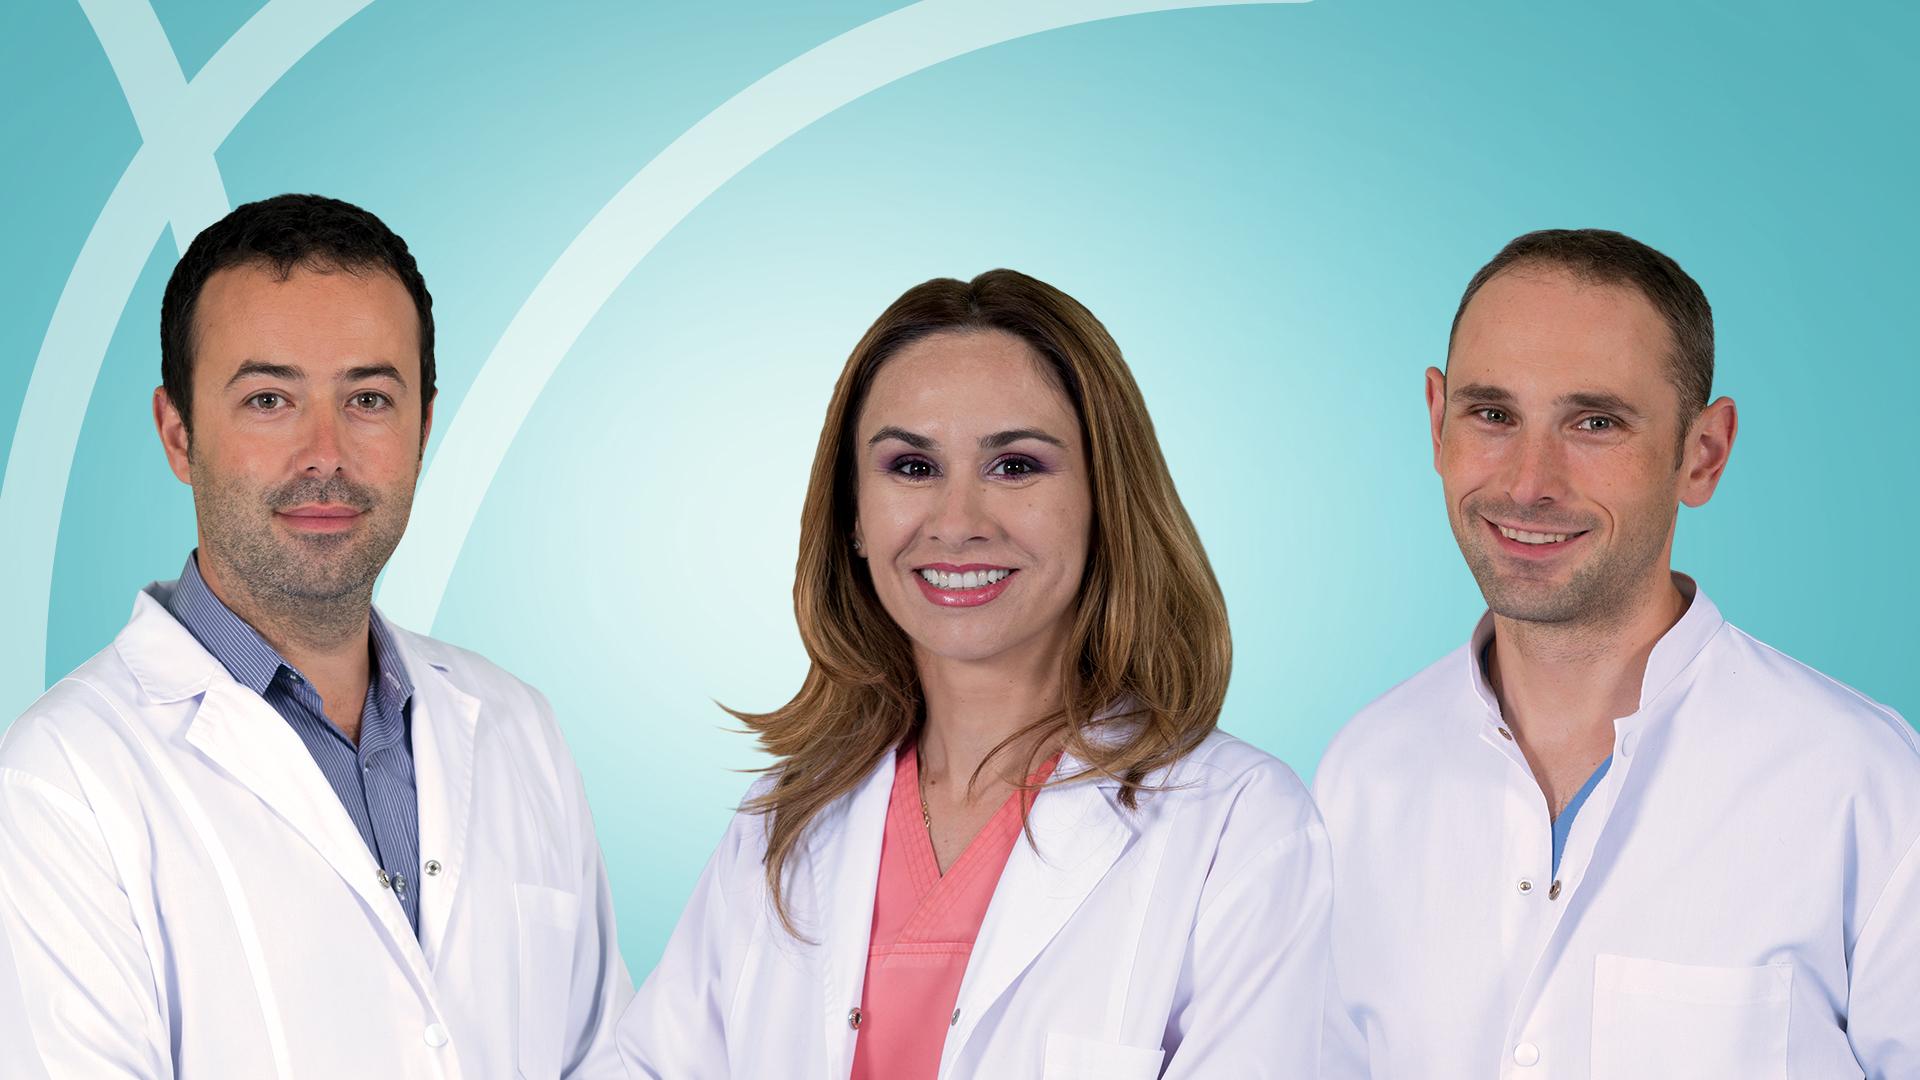 Echipa Brain Institute - Dr. Sergiu Stoica, dr. Anca Visan si dr. Mihai Craciun (de la stanga la dreapta)